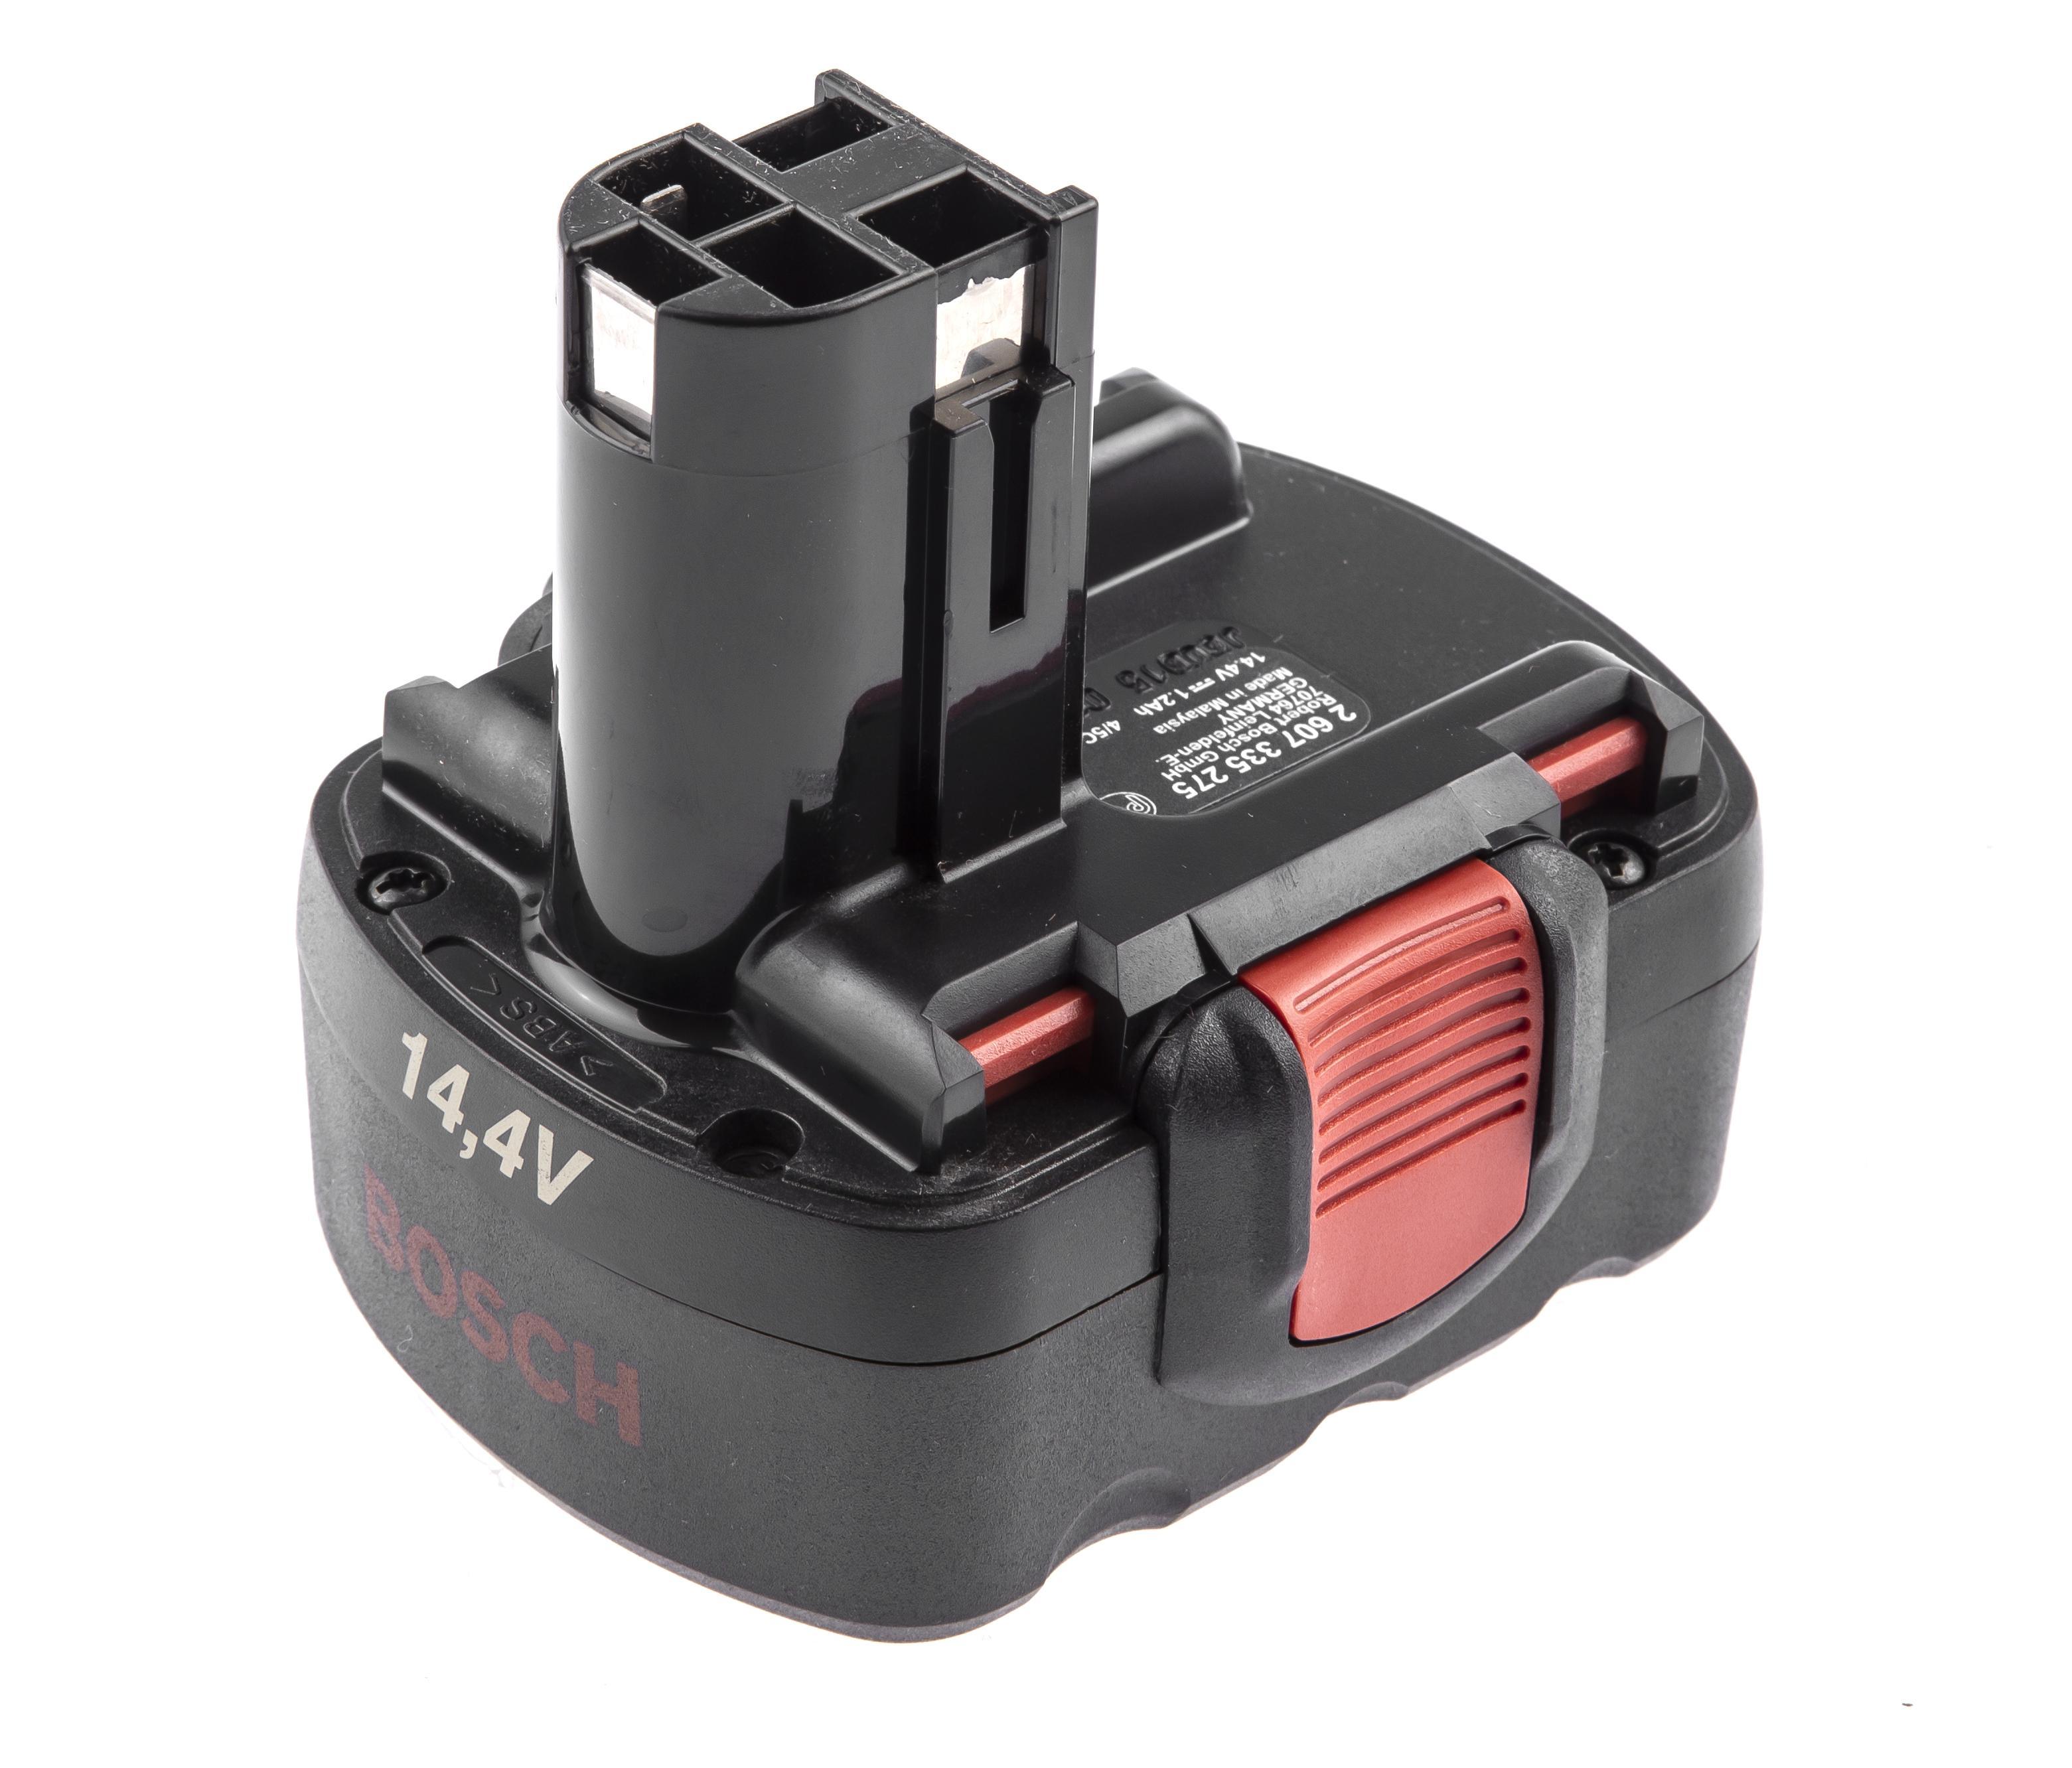 цена на Аккумулятор Bosch 2.607.335.275